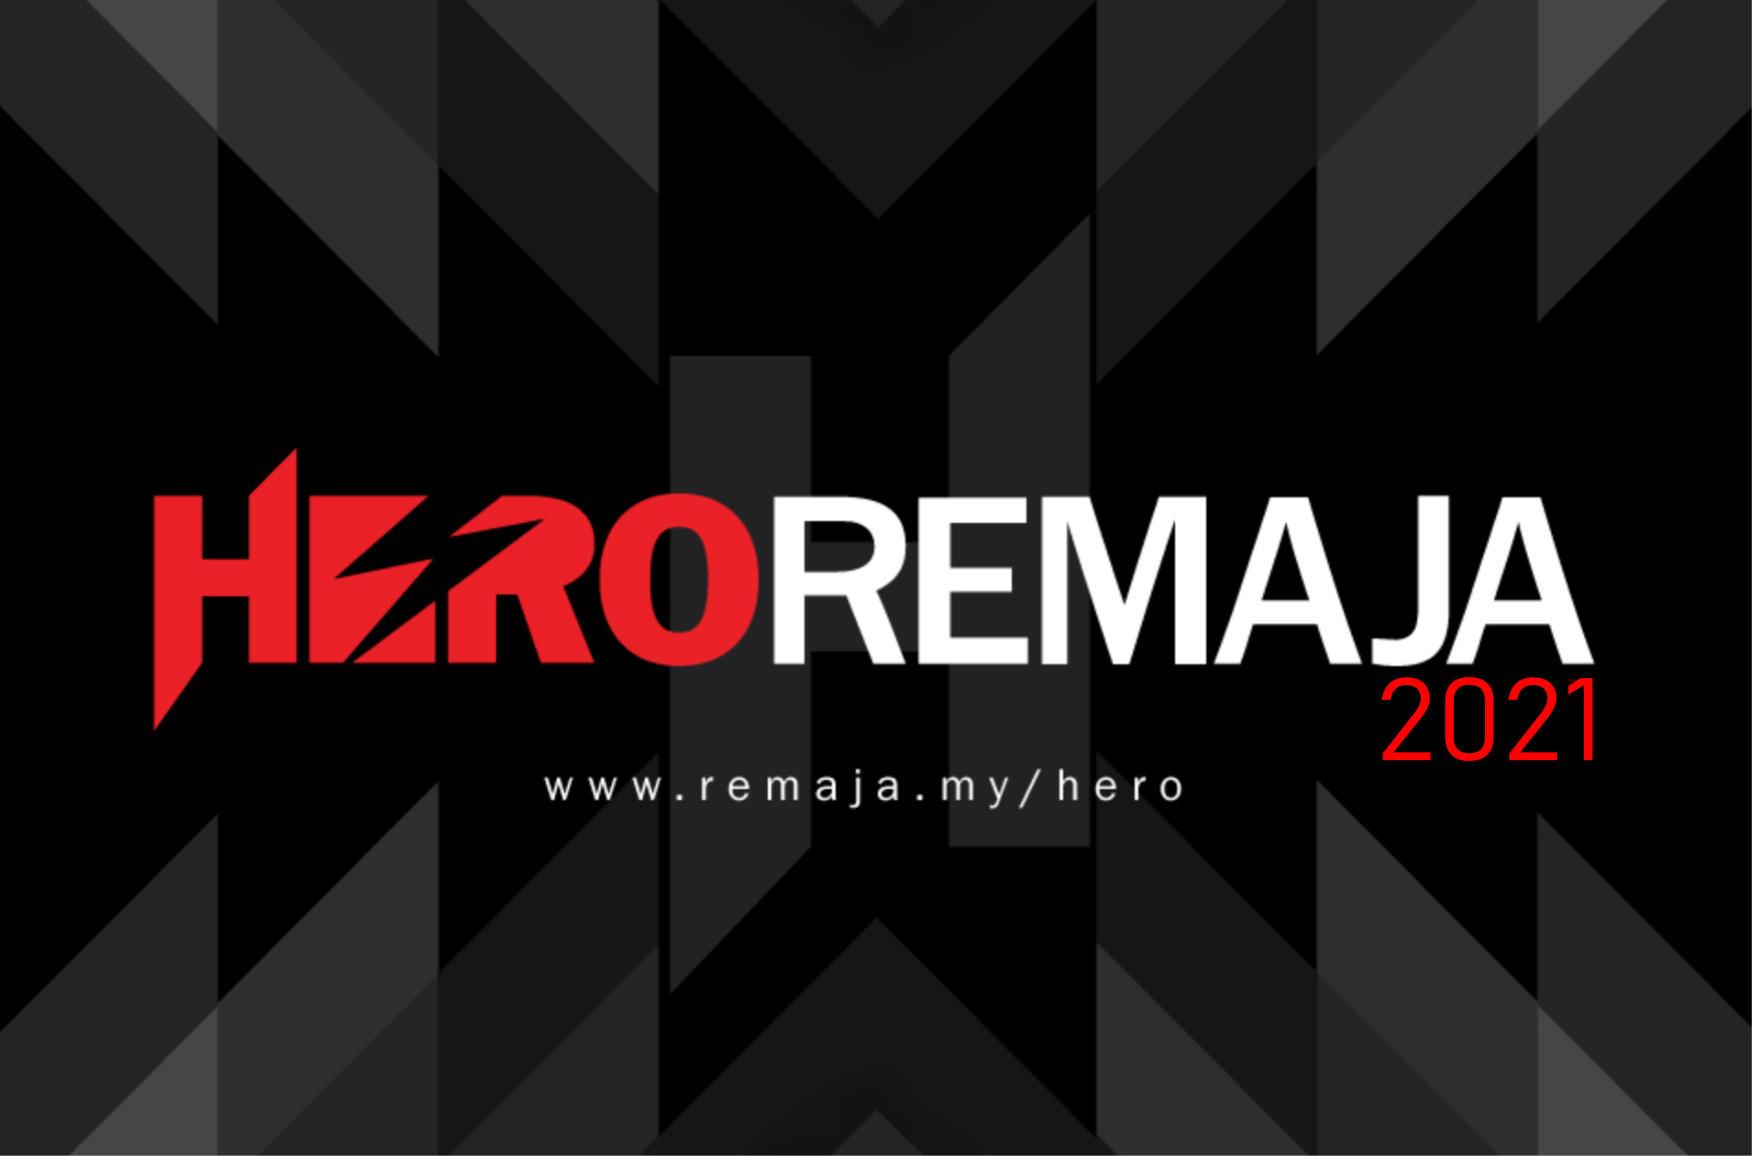 Pencarian Peserta Hero Remaja 2021 Kini Bermula! Ikuti Cara Permohonan Secara Online Disini